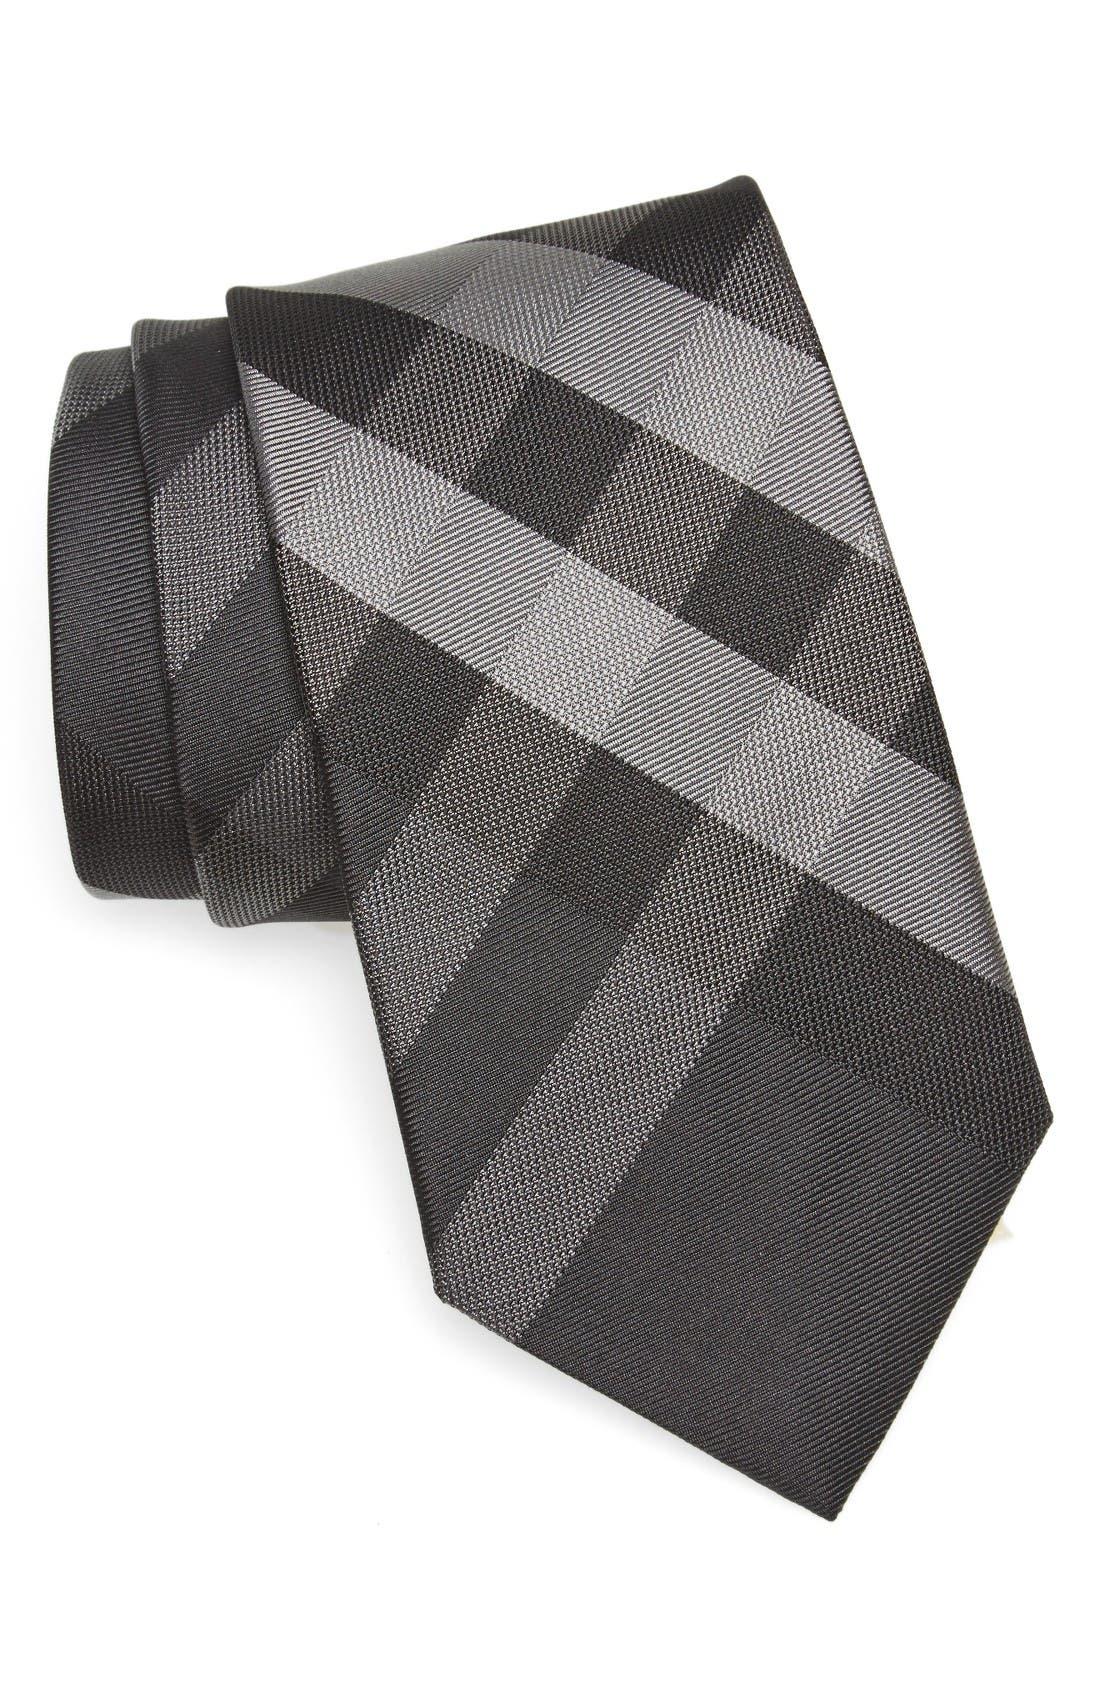 Burberry Clinton Check Silk Tie